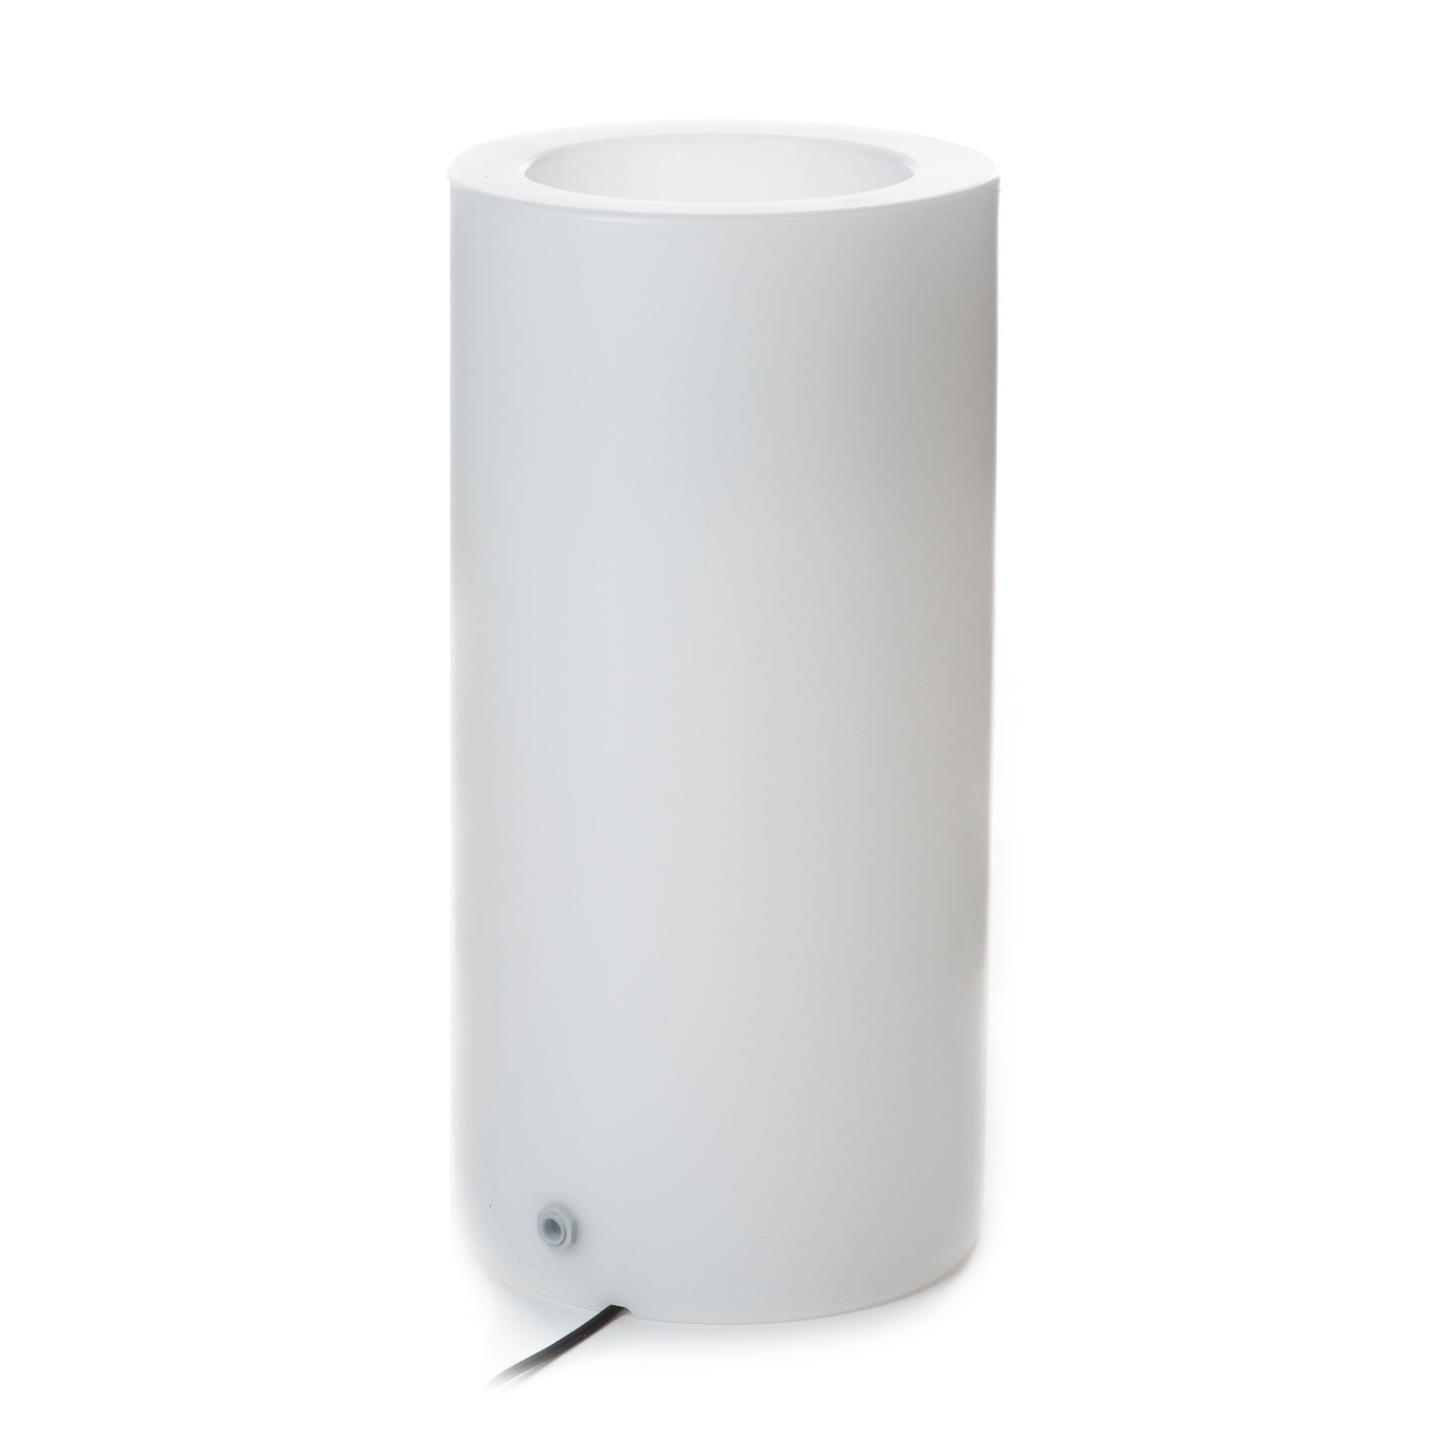 Vase Light Indoor / Outdoor Stem | White